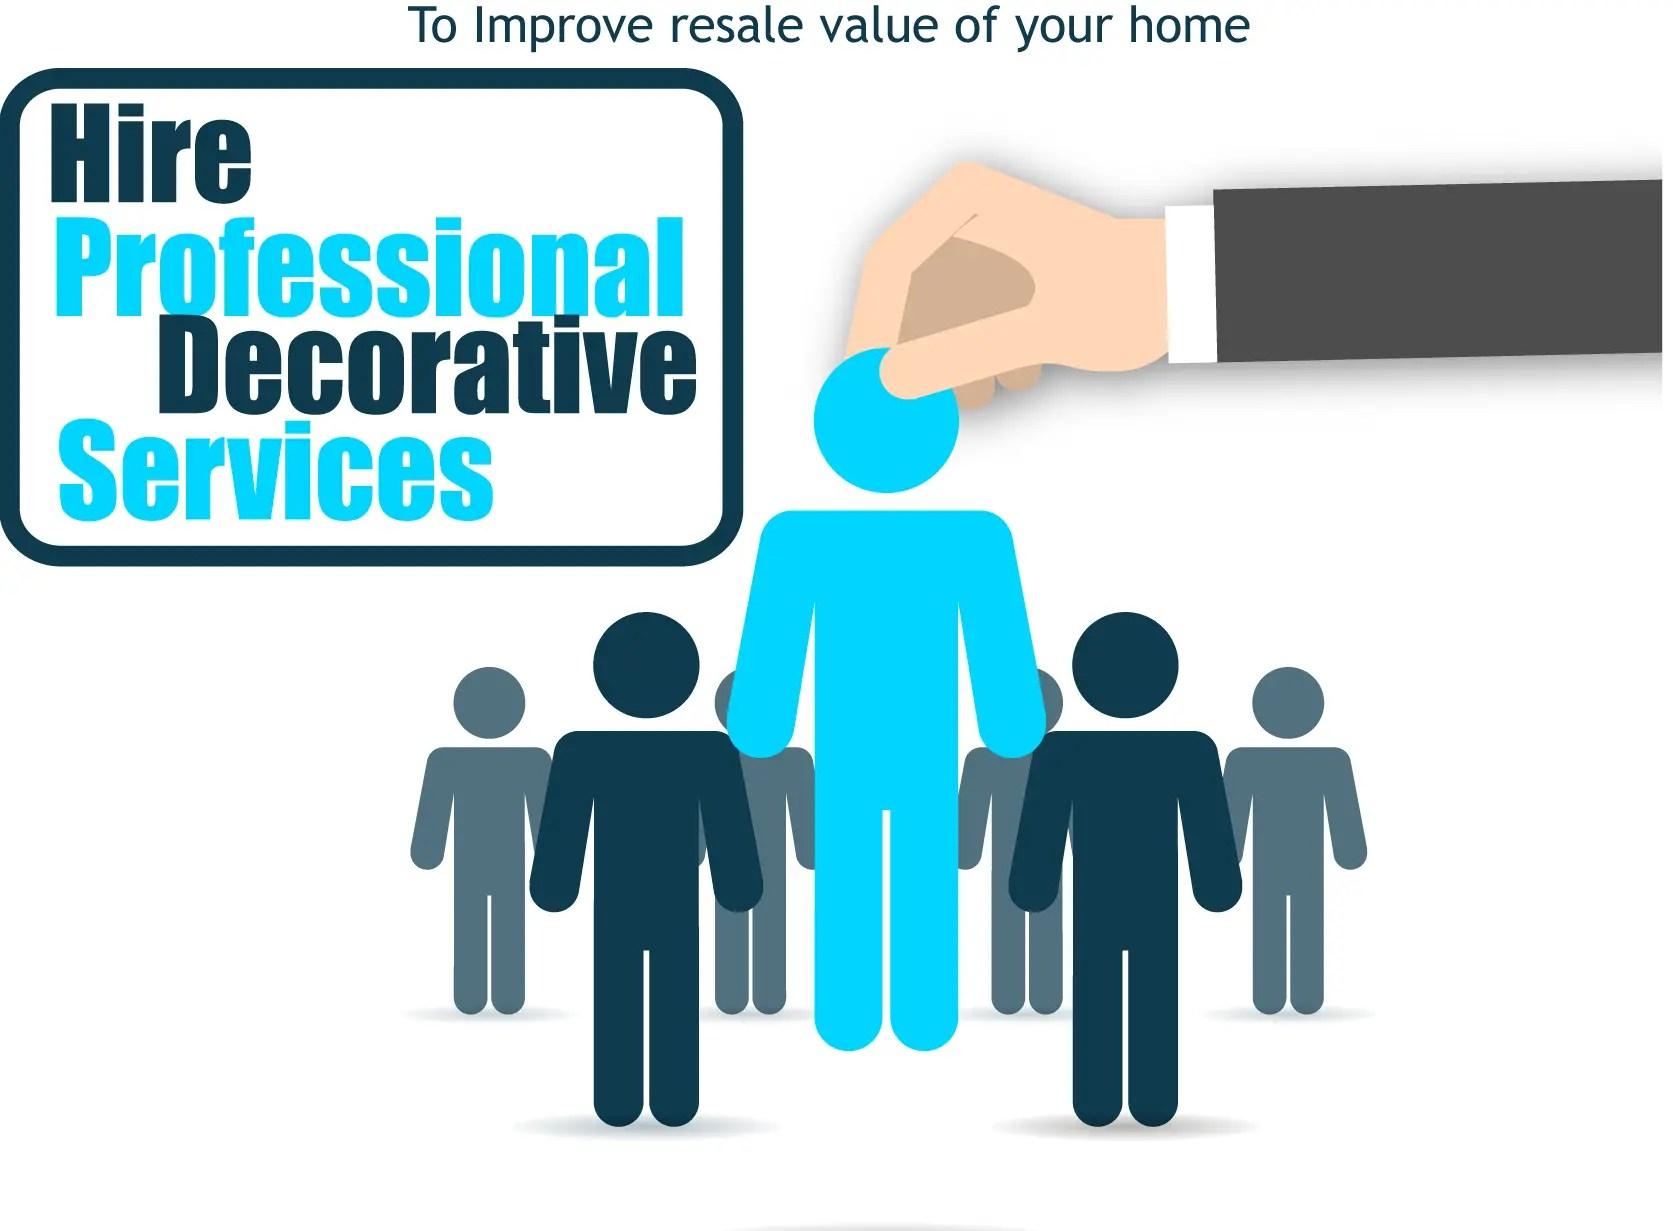 Hire Professionals to Improve Resale Value